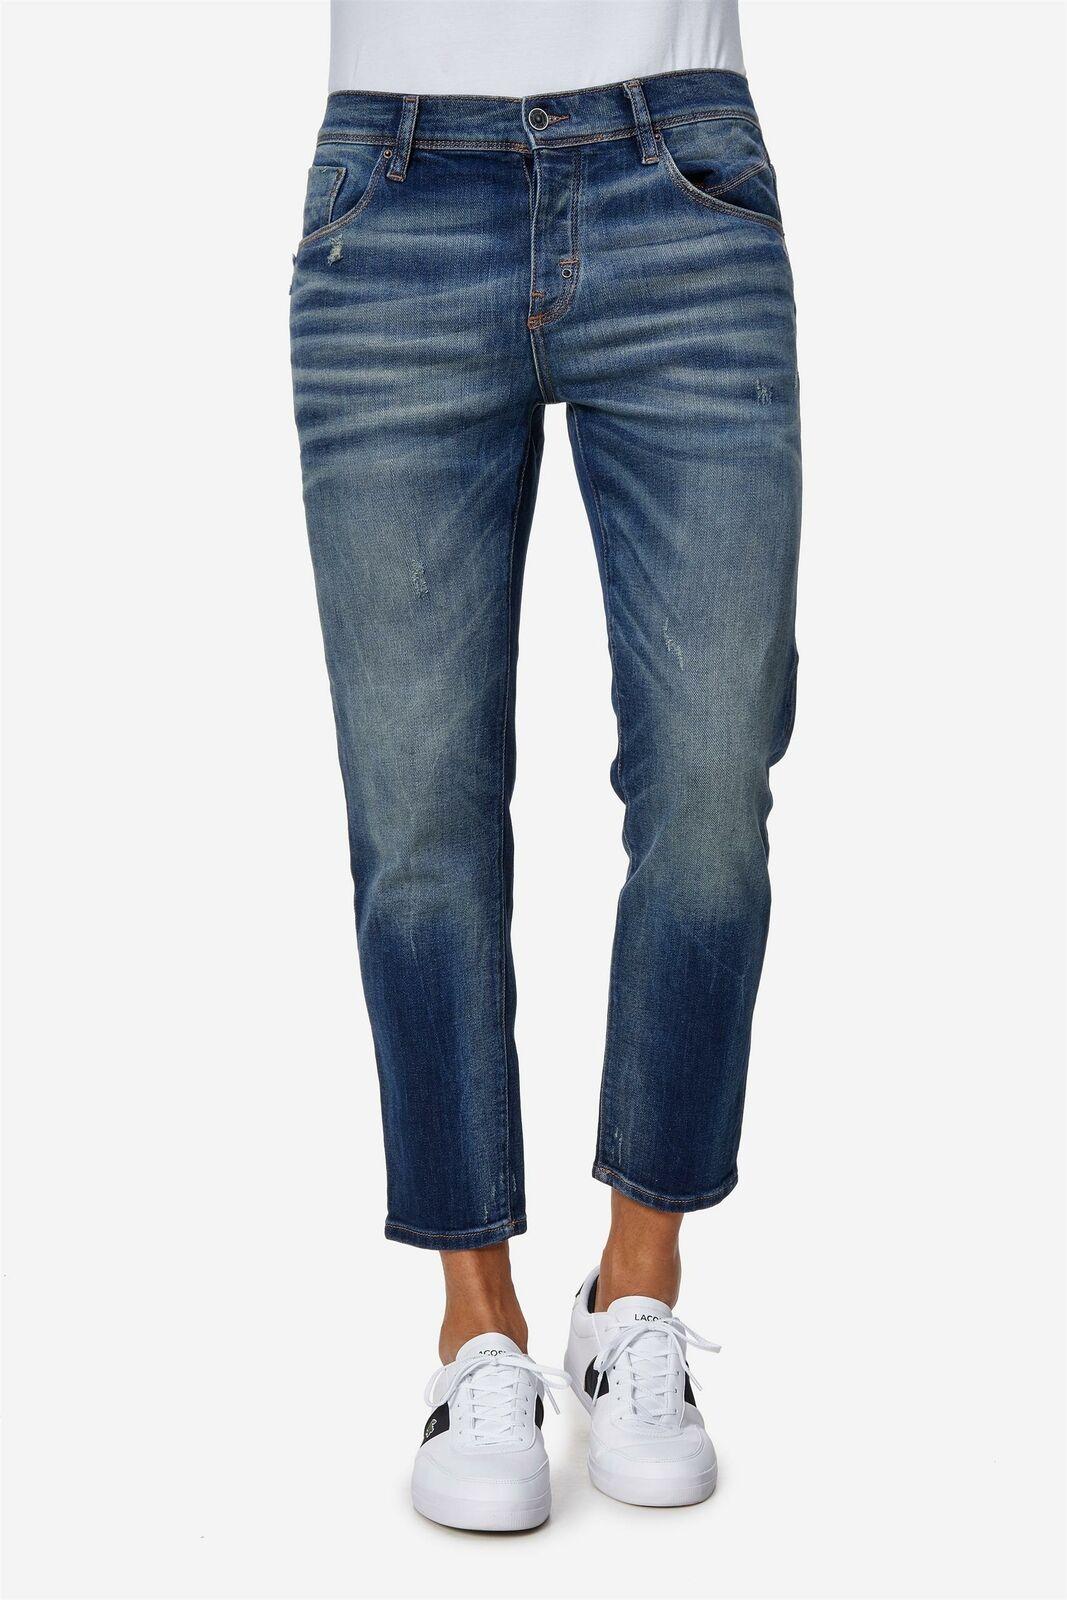 Antony Morato - Jeans Herren leger Destryed-Details blau NEU: 89 €